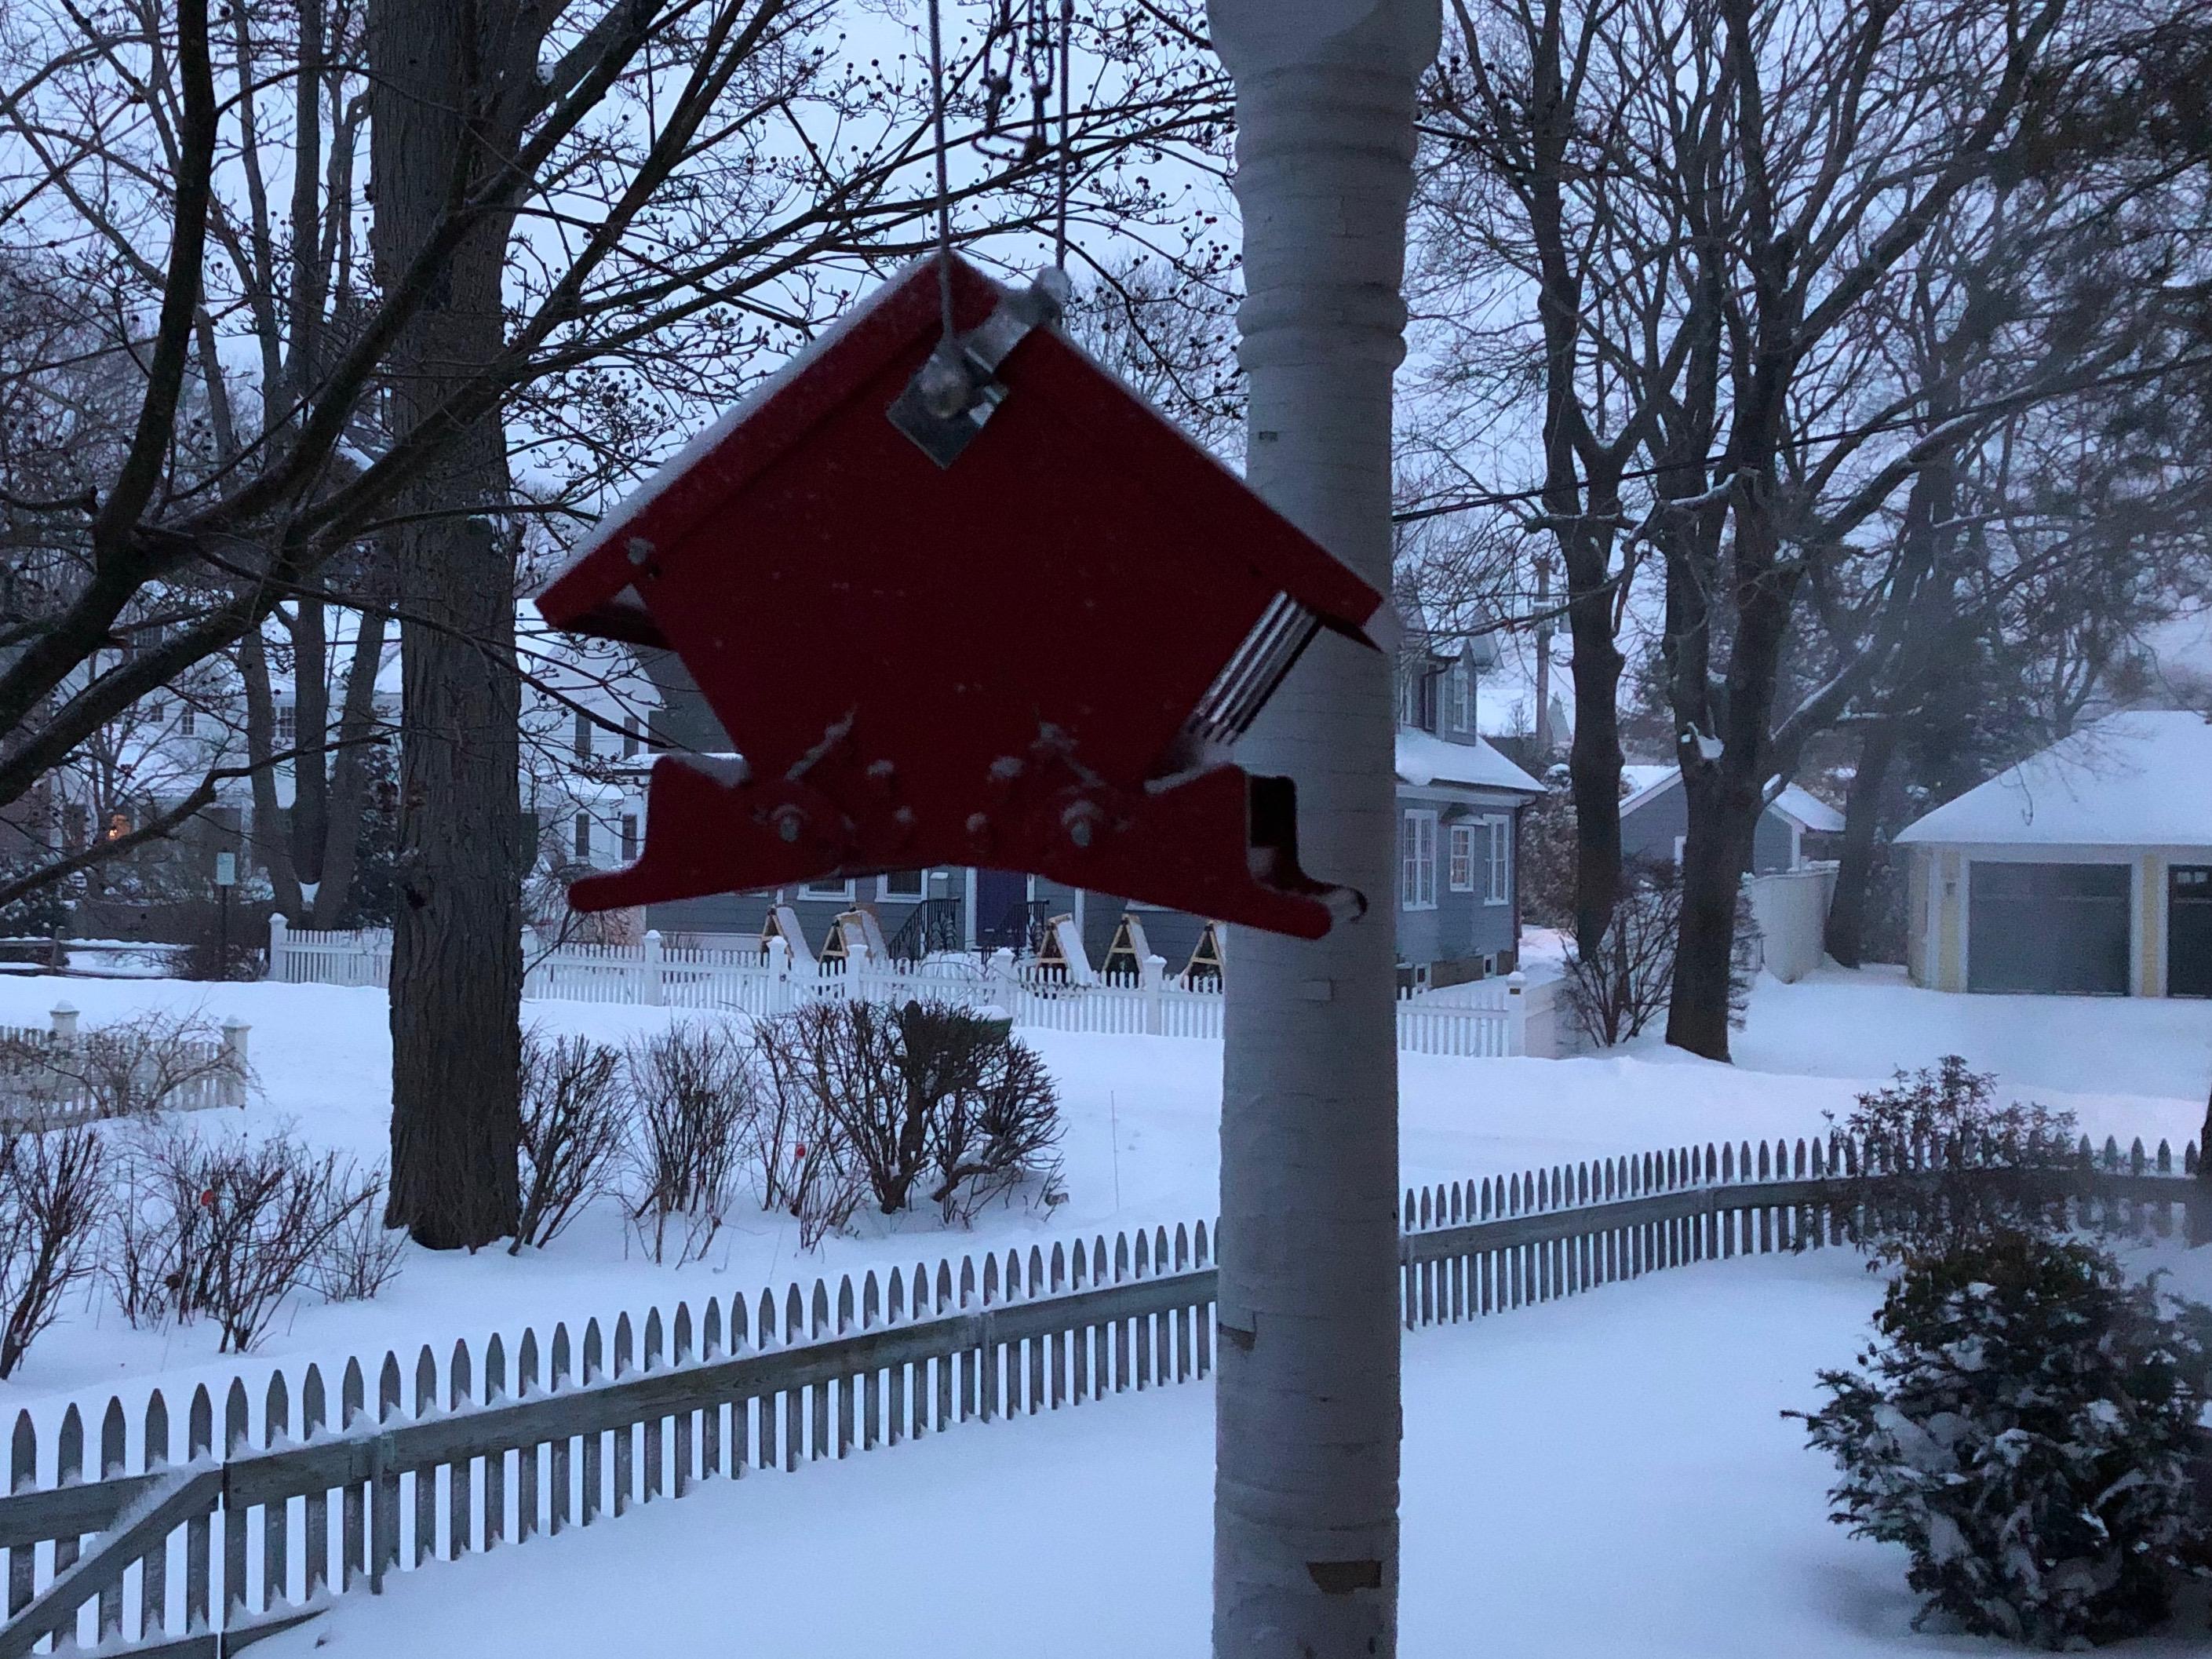 012019-bird-feeder-in-blue-dawn-snow